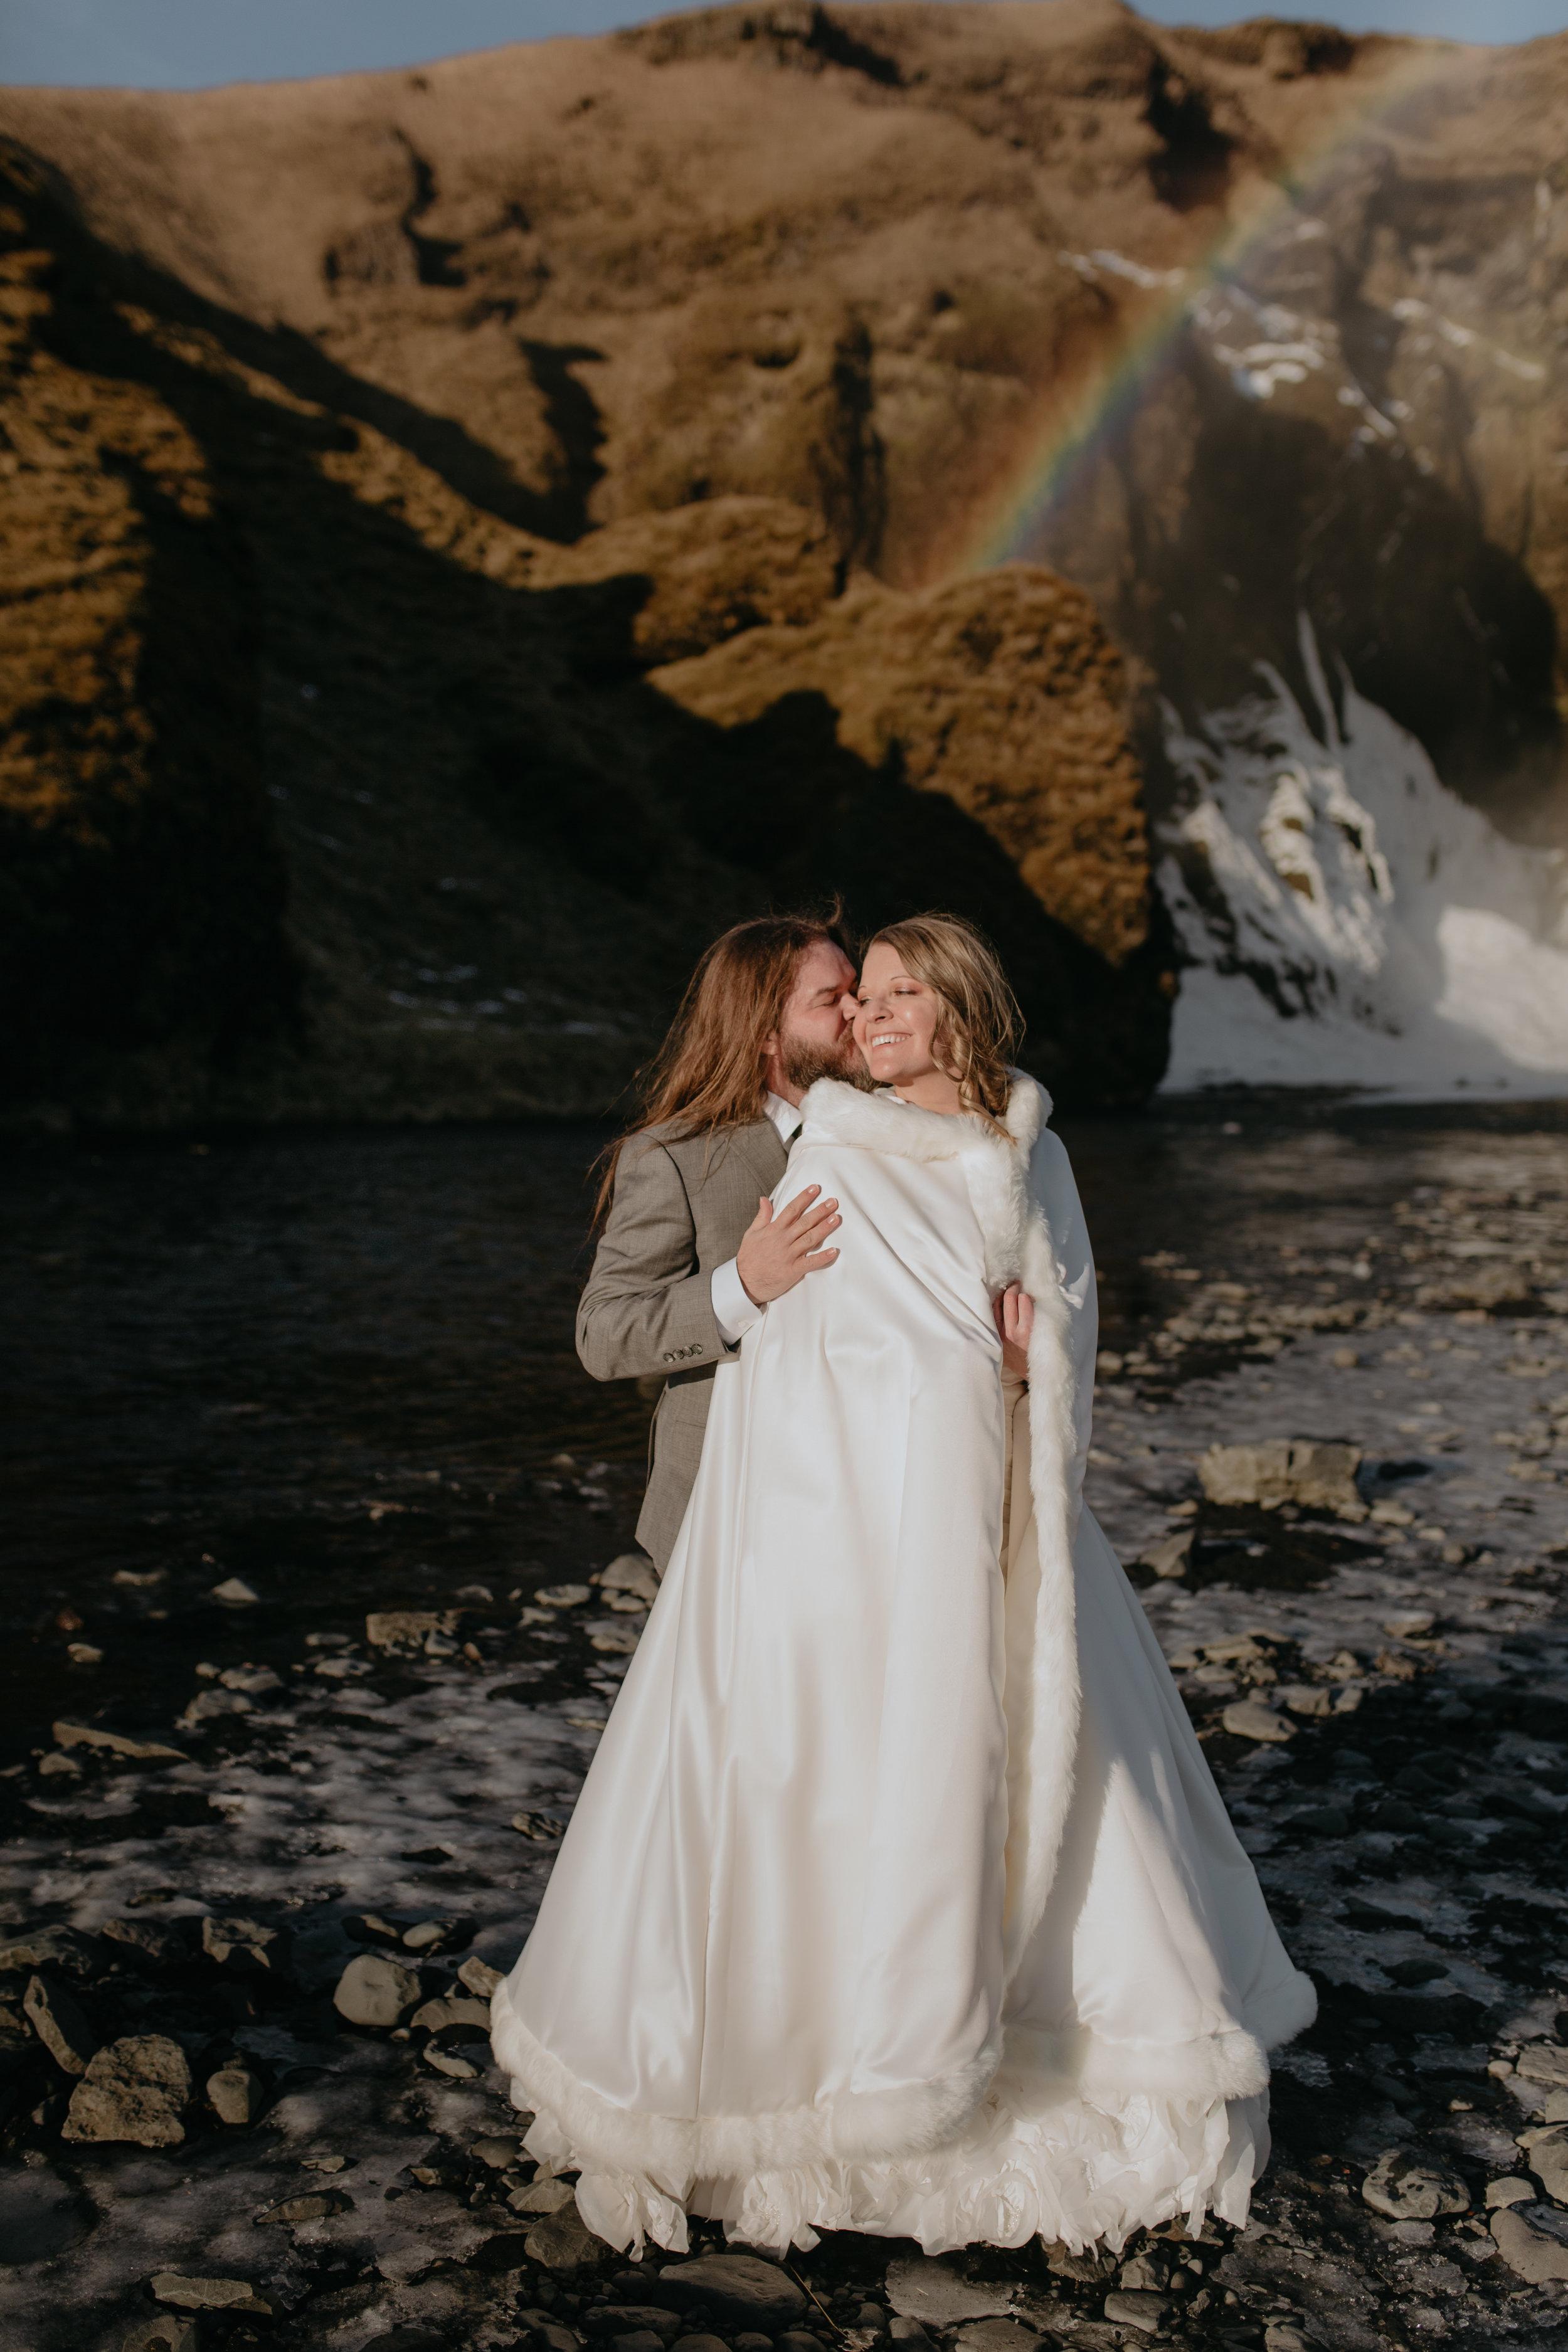 nicole-daacke-photography-iceland-winter-sunset-adventure-elopement-skogafoss-waterfall-black-sand-beach-dyrholaey-vik-iceland-intimate-wedding-black-church-elopement-photographer-3.jpg